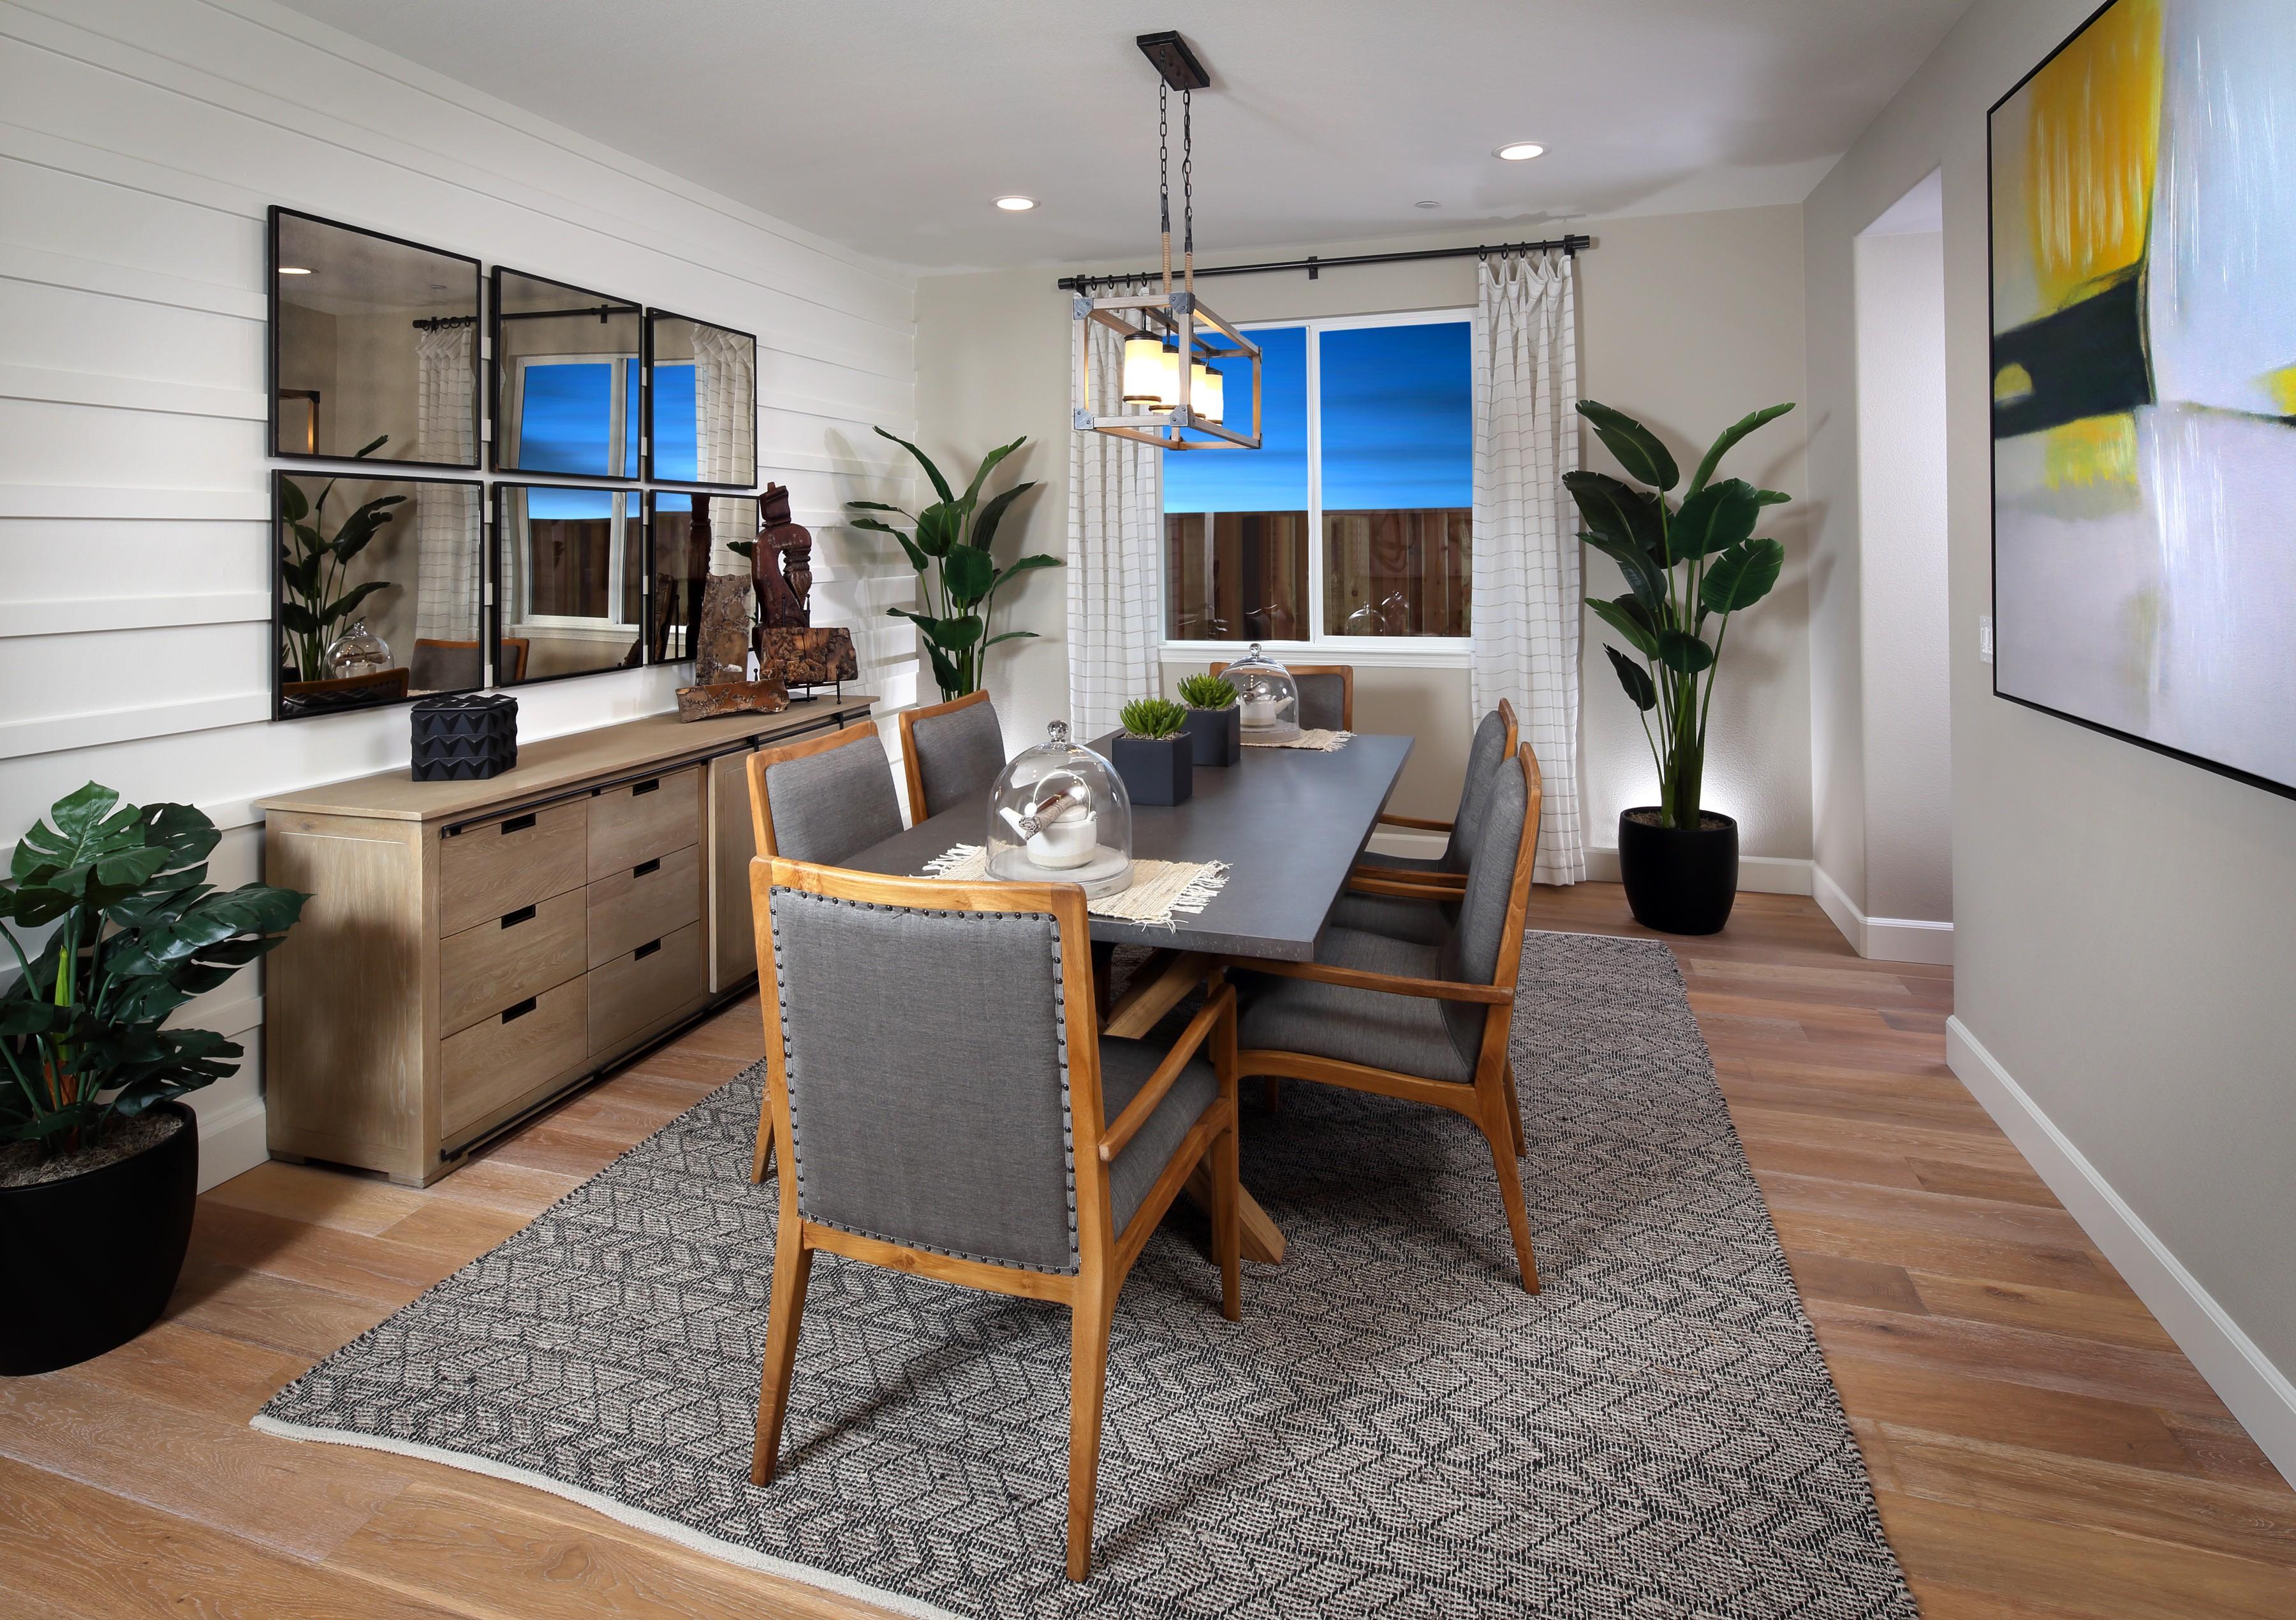 Dining room flooring   Elite Builder Services